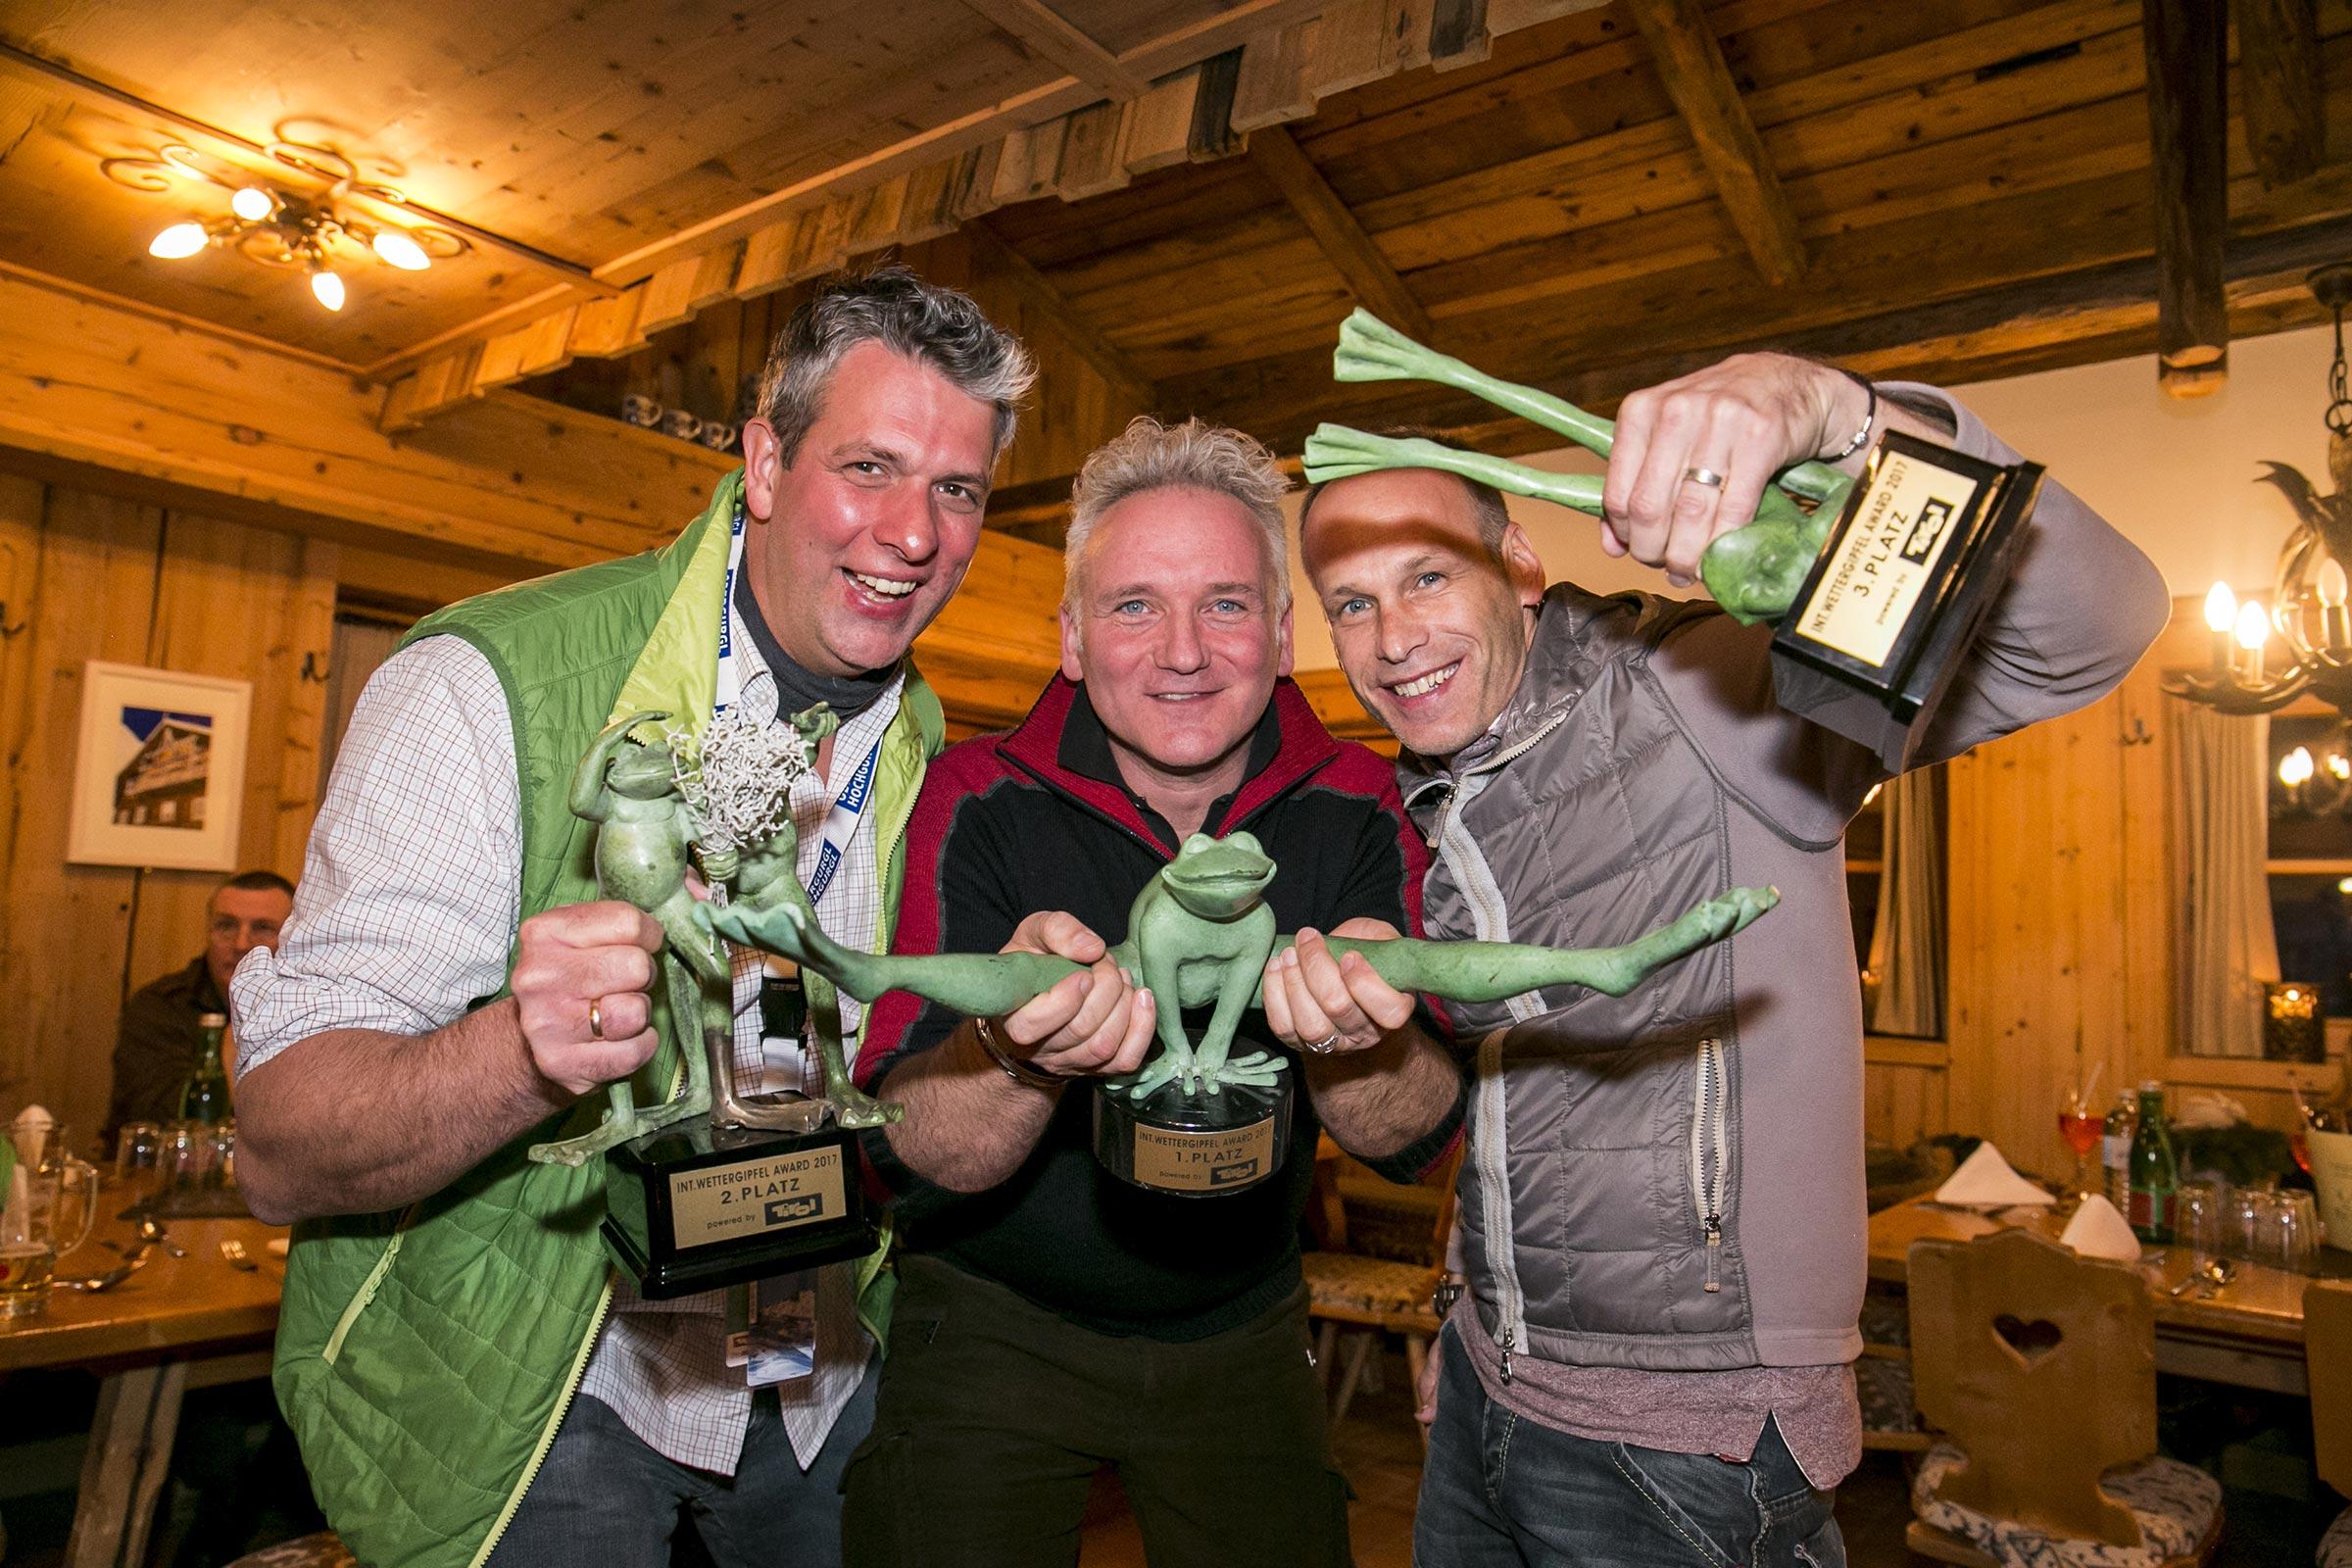 Wettergipfel Award - Wettergipfel Obergurgl-Hochgurgl